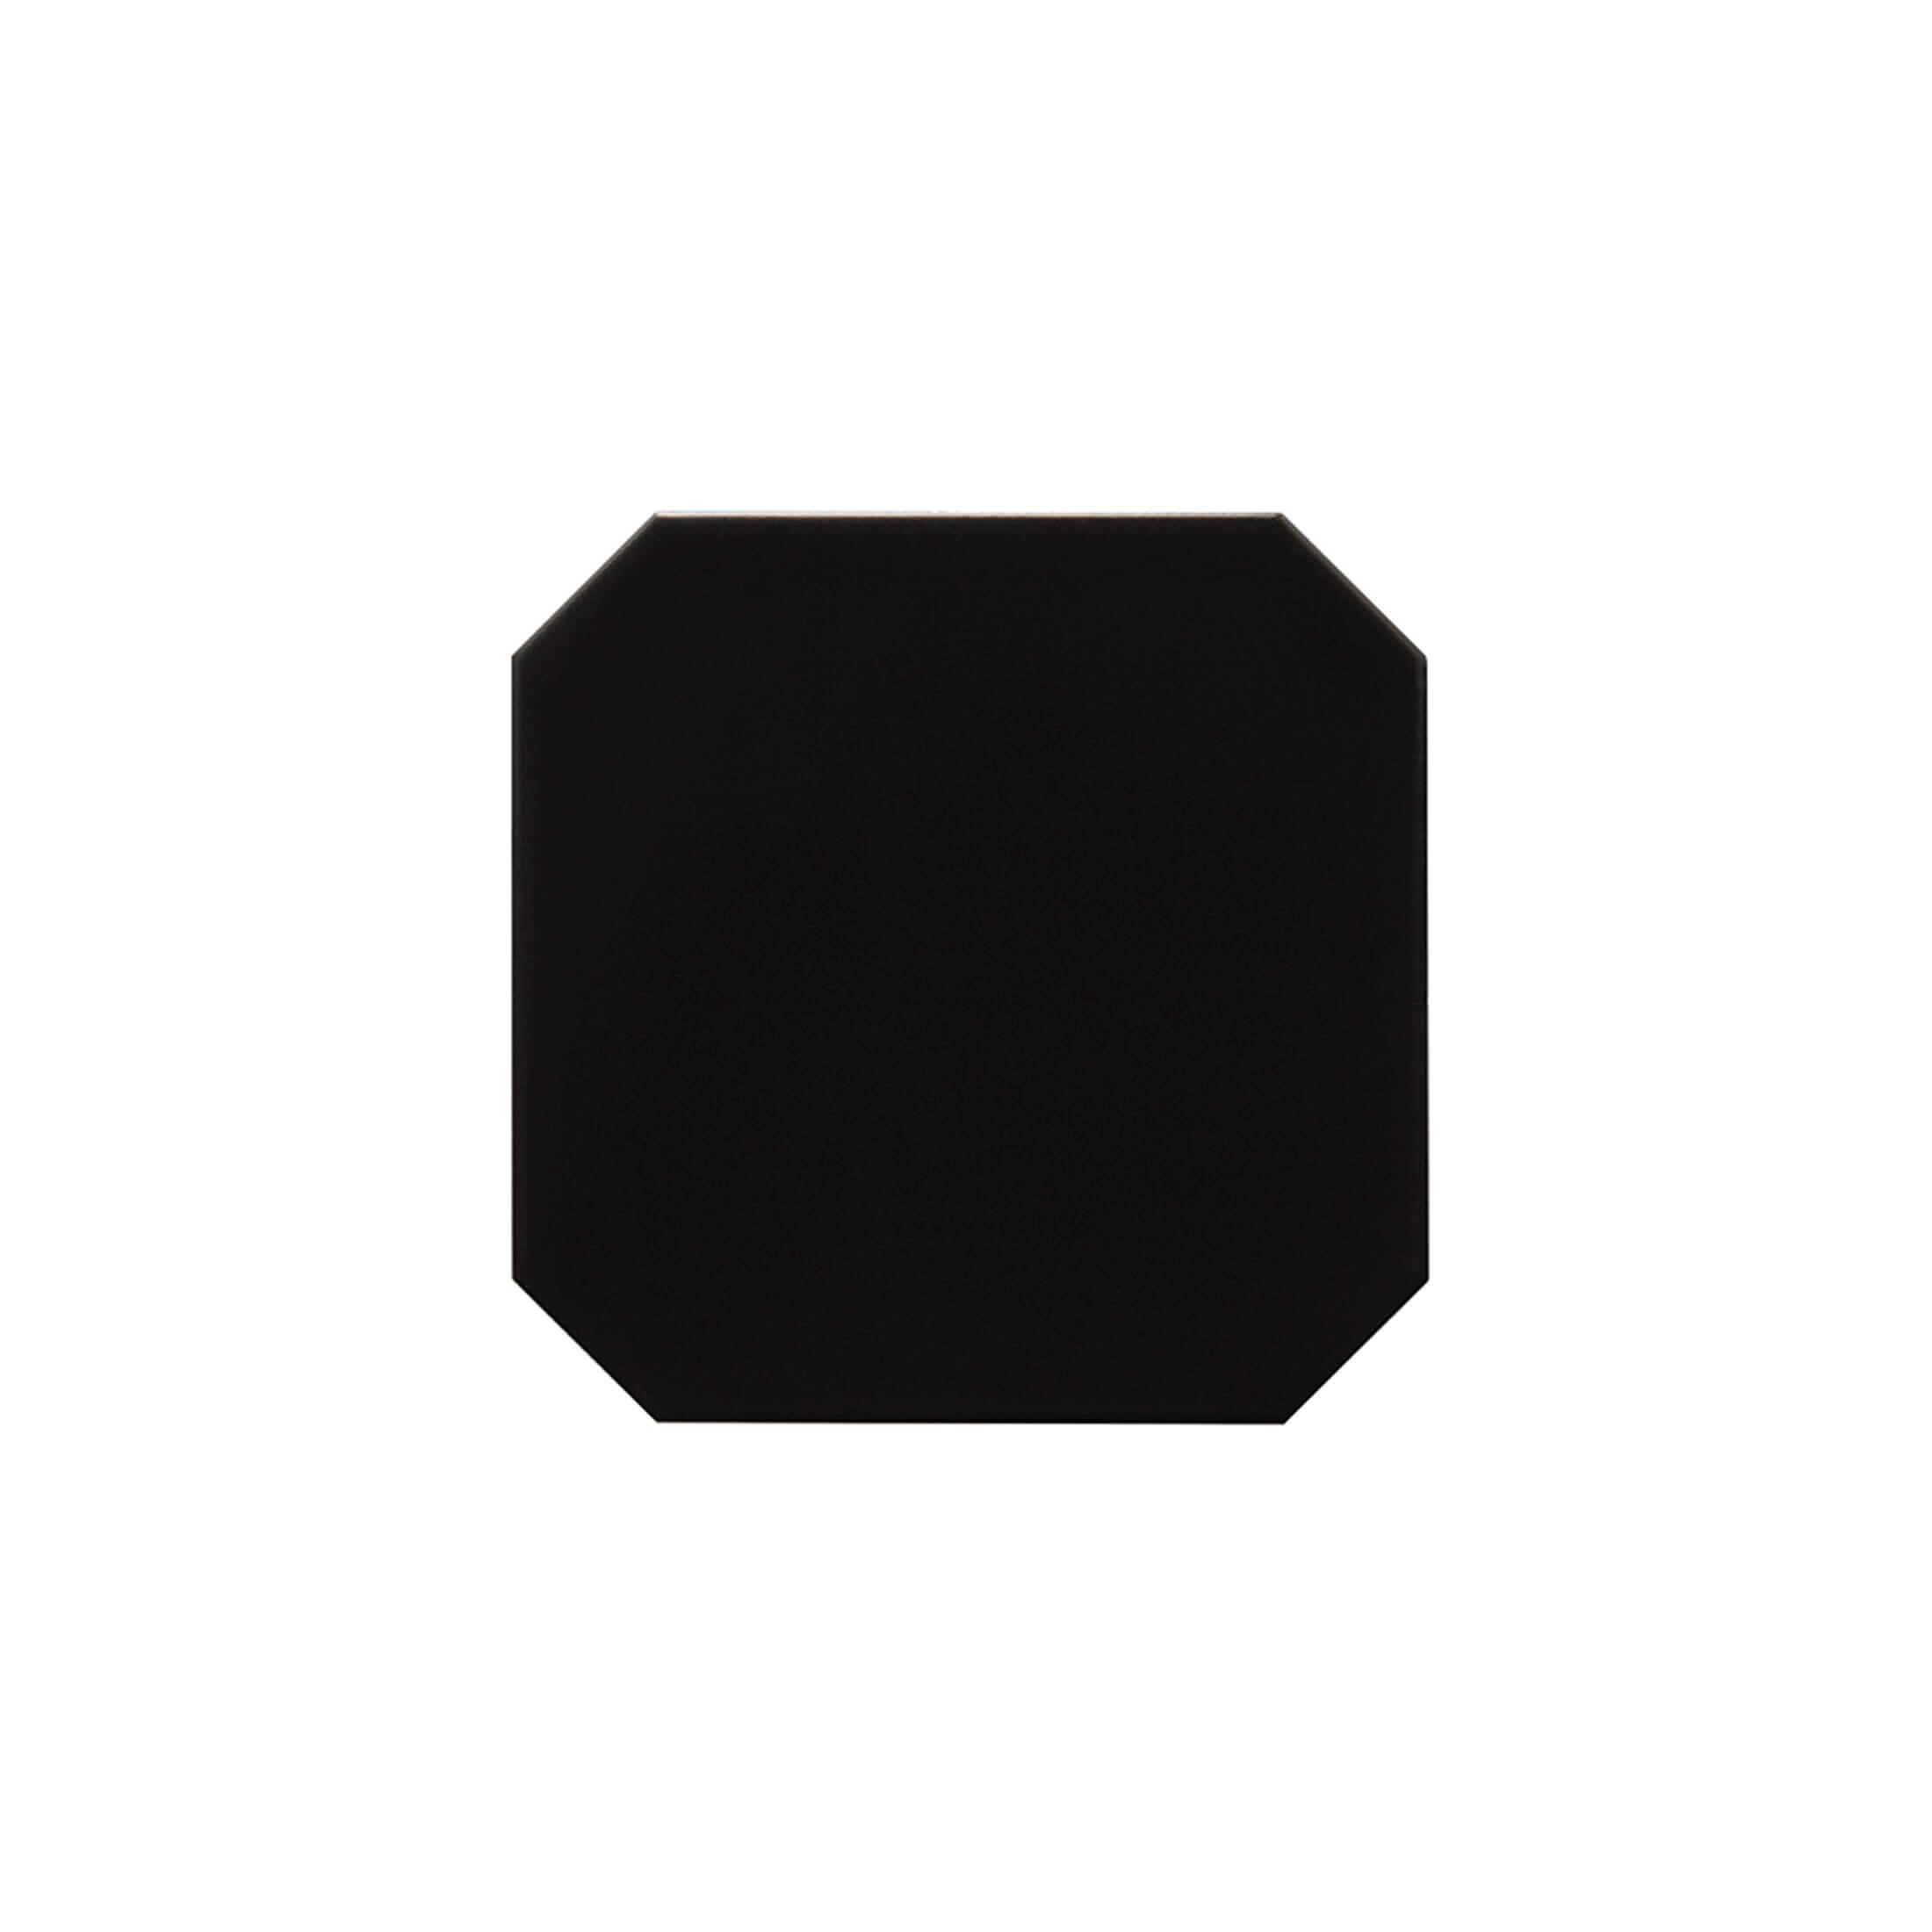 ADPV9003 - PAVIMENTO NEGRO - 15 cm X 15 cm